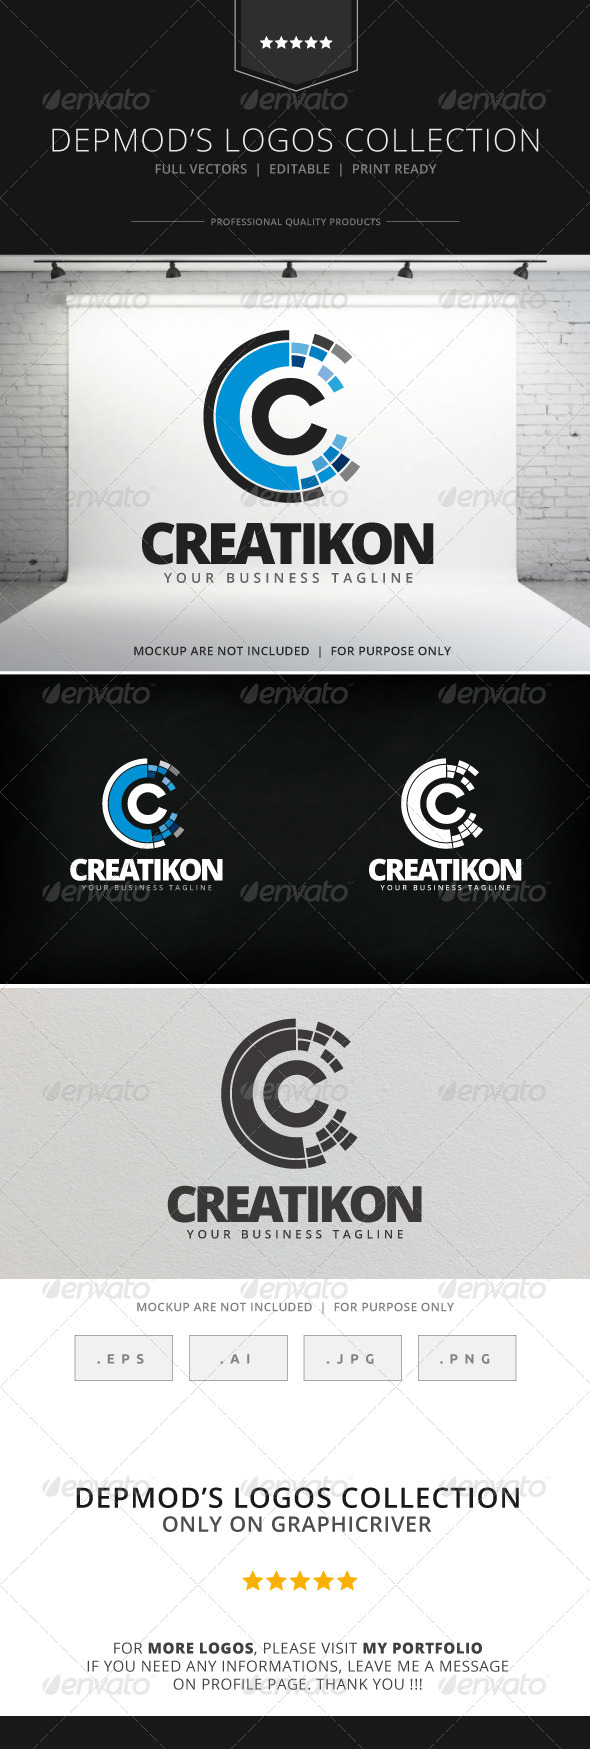 GraphicRiver Creatikon Logo 7900629